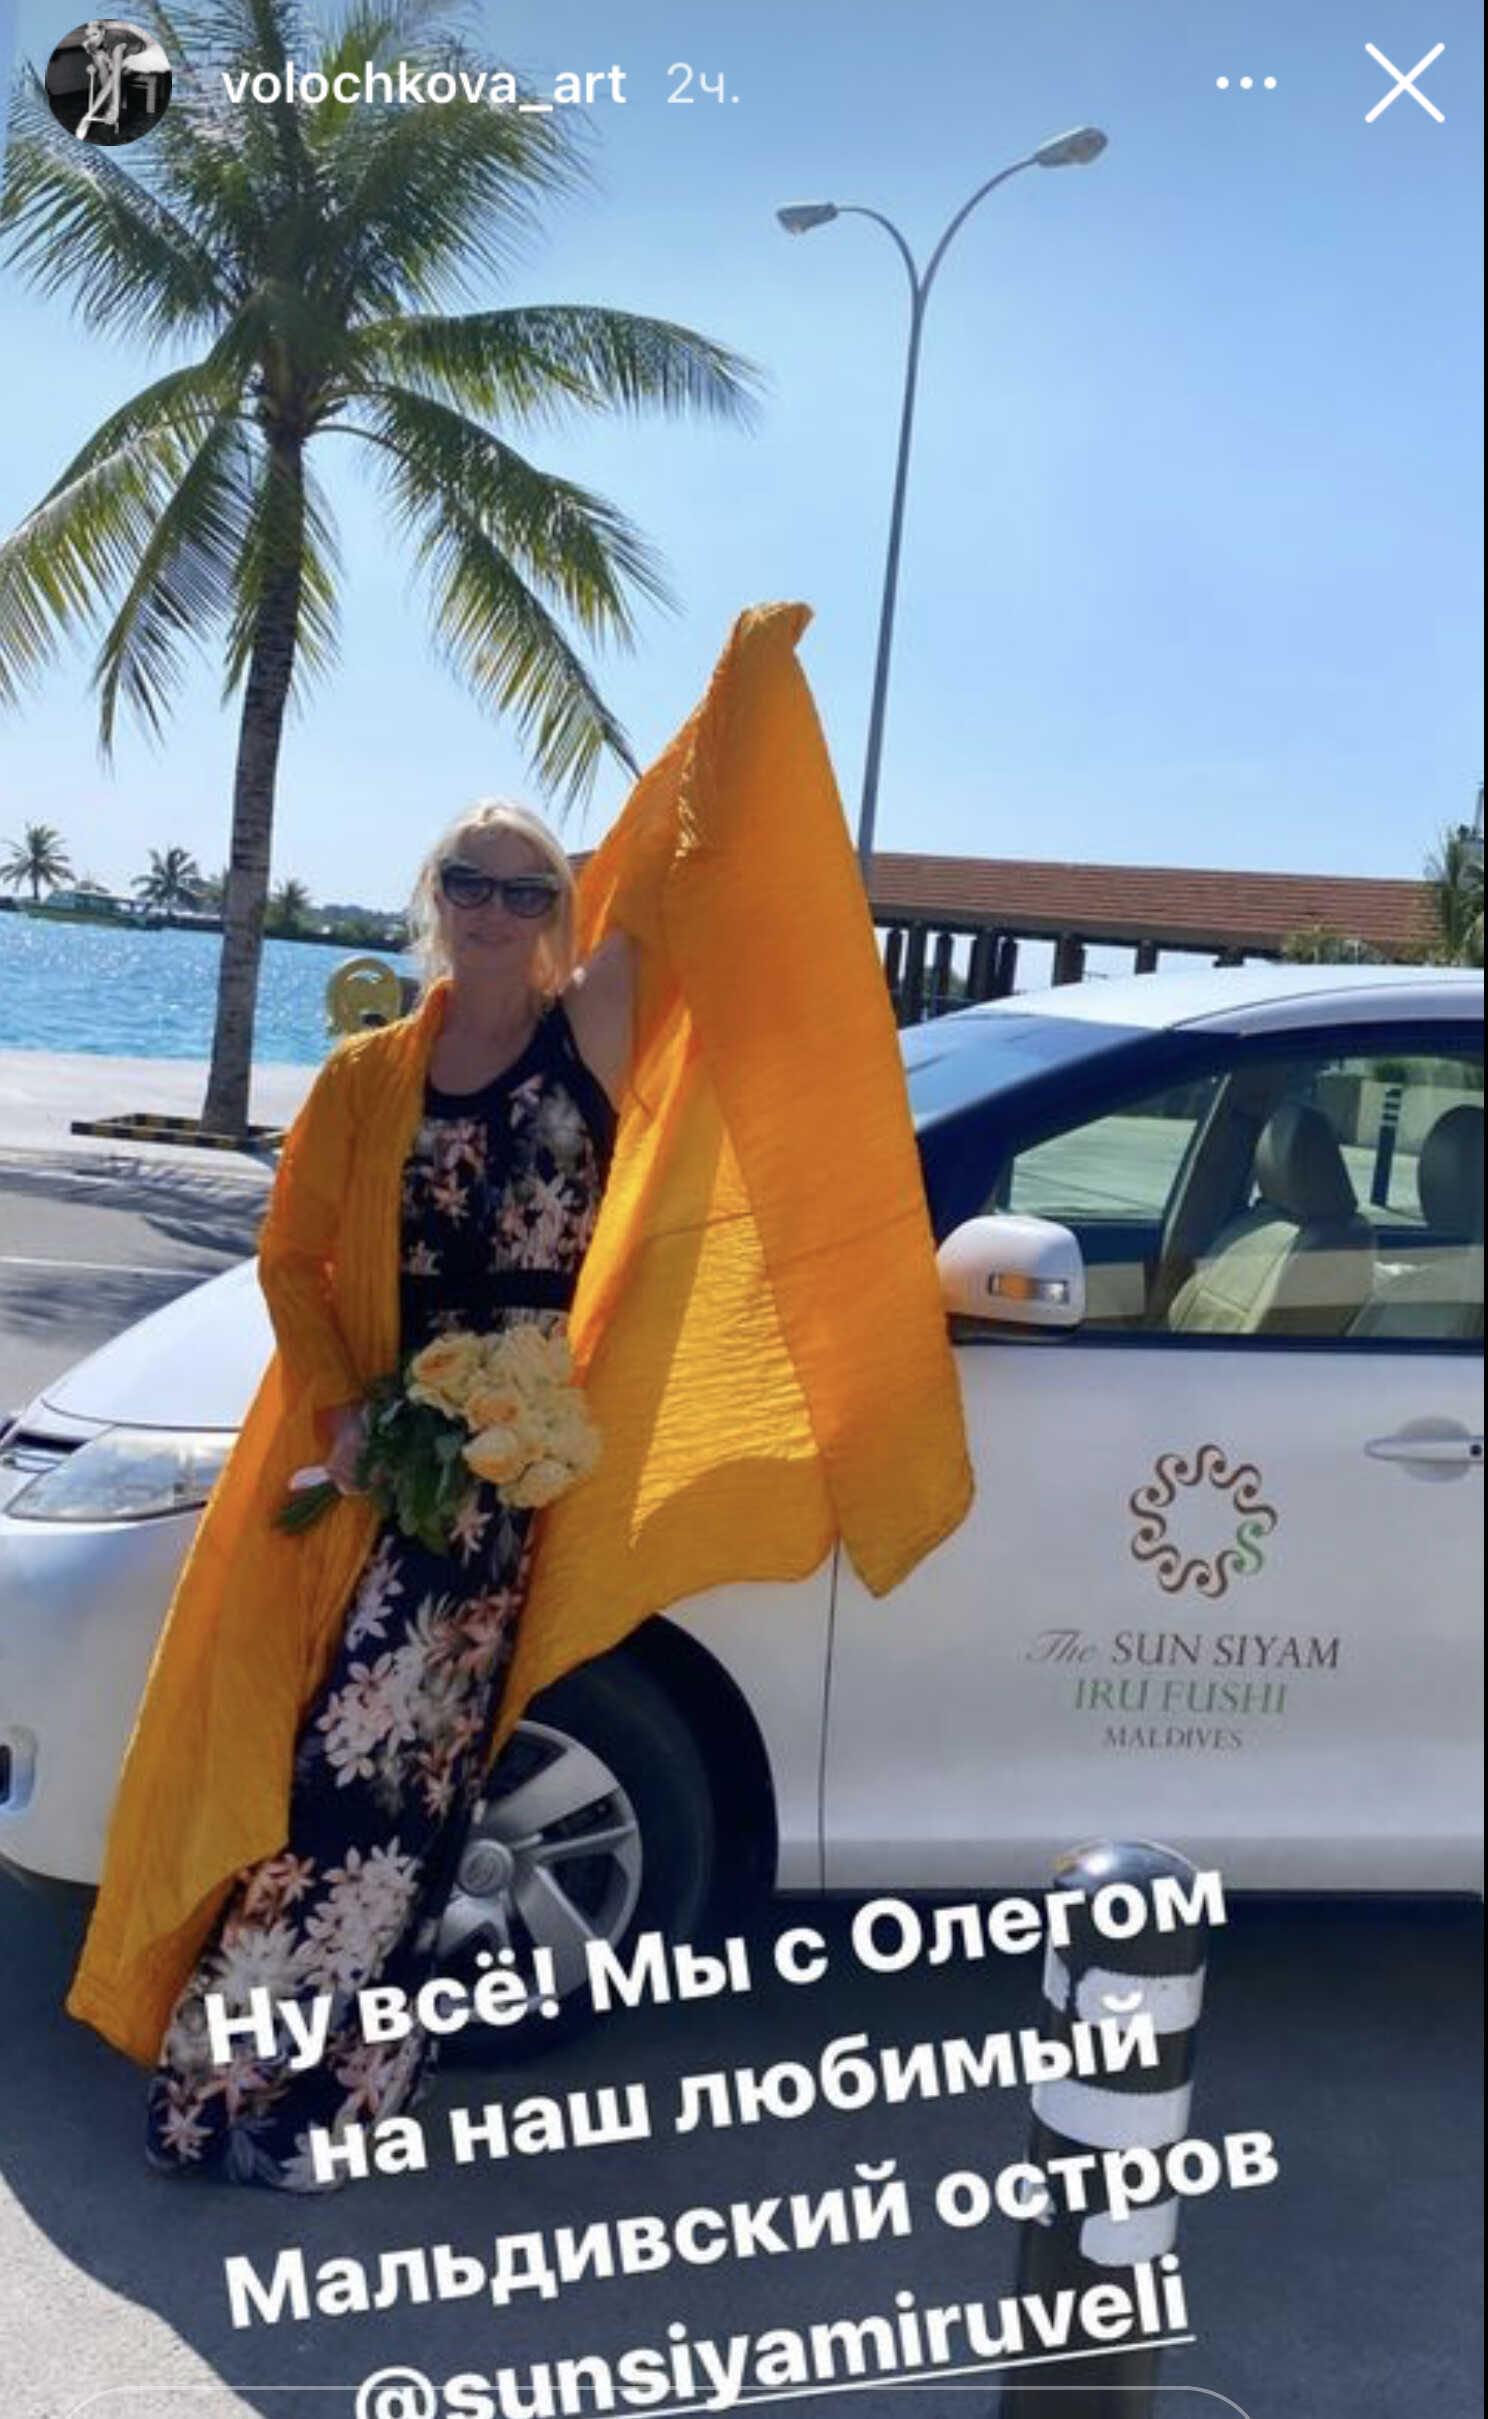 Anastasia Volochkova took her Beloved to the Maldives again